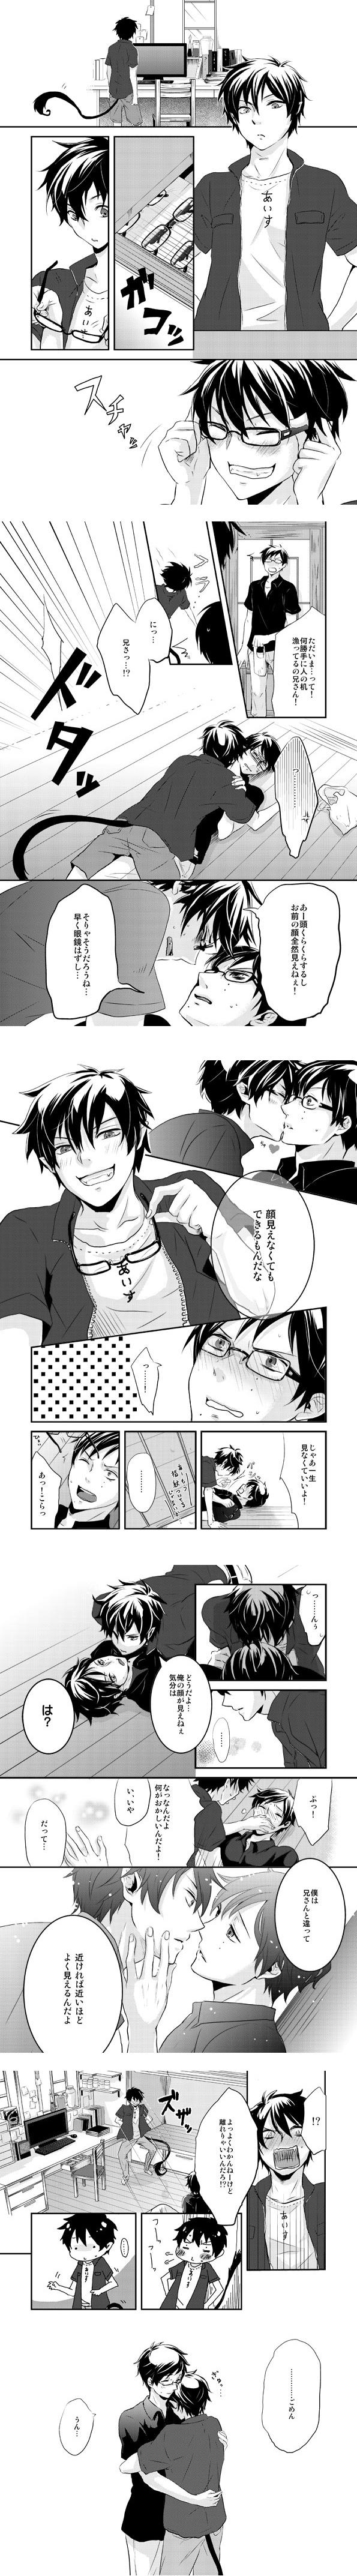 Tags: Anime, K-anzu, Ao no Exorcist, Okumura Yukio, Okumura Rin, Pixiv, Translation Request, YukiRin (Pairing), Blue Exorcist